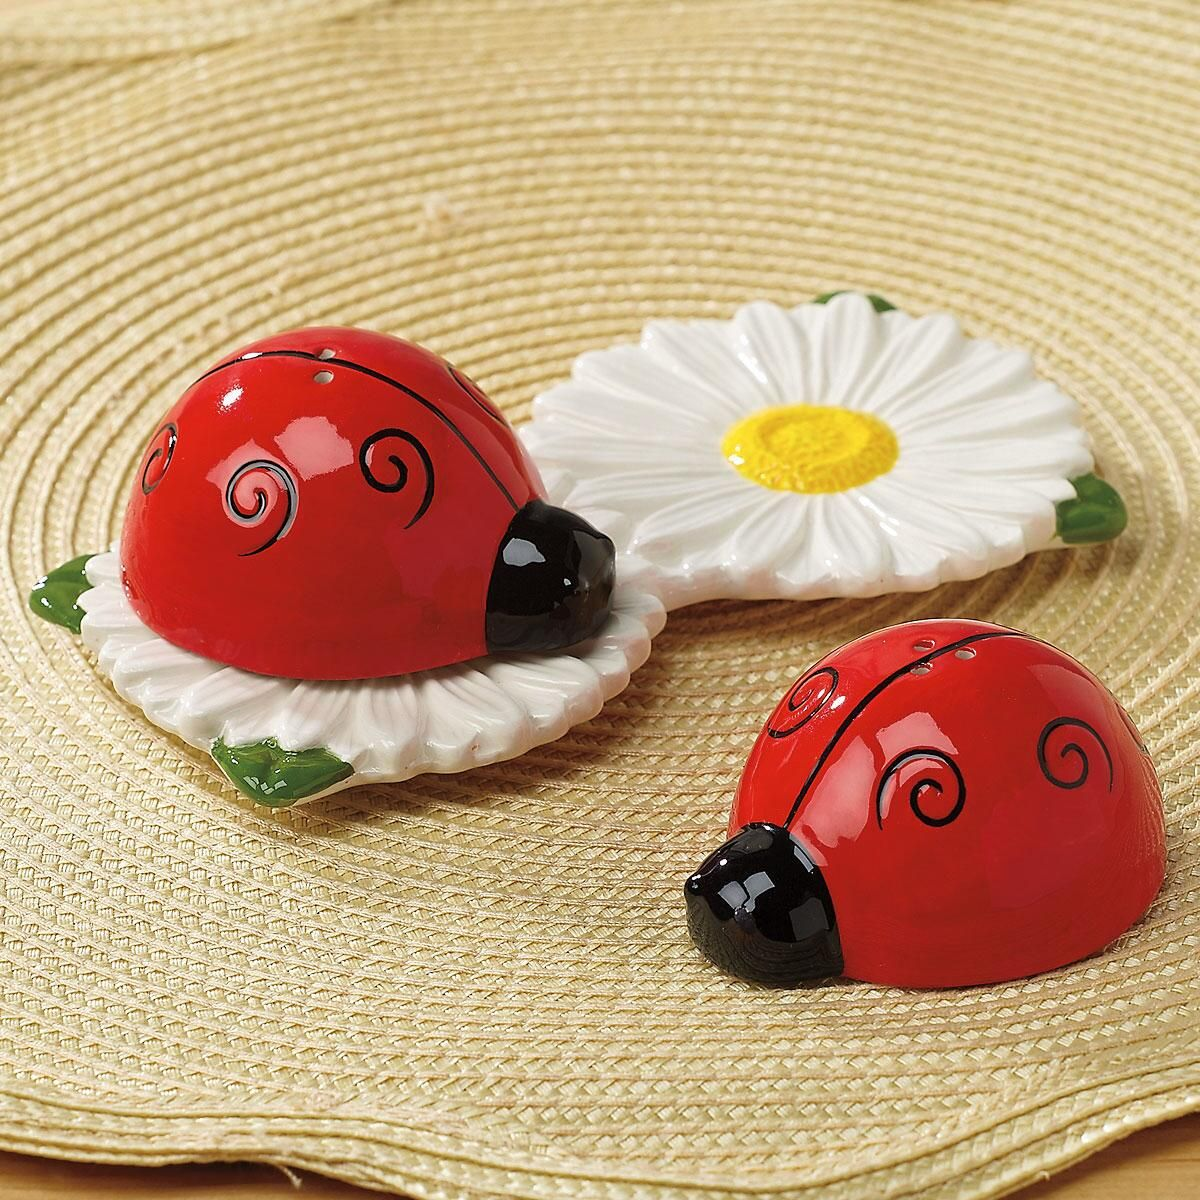 Ceramic Ladybug & Daisy Salt & Pepper Shakers